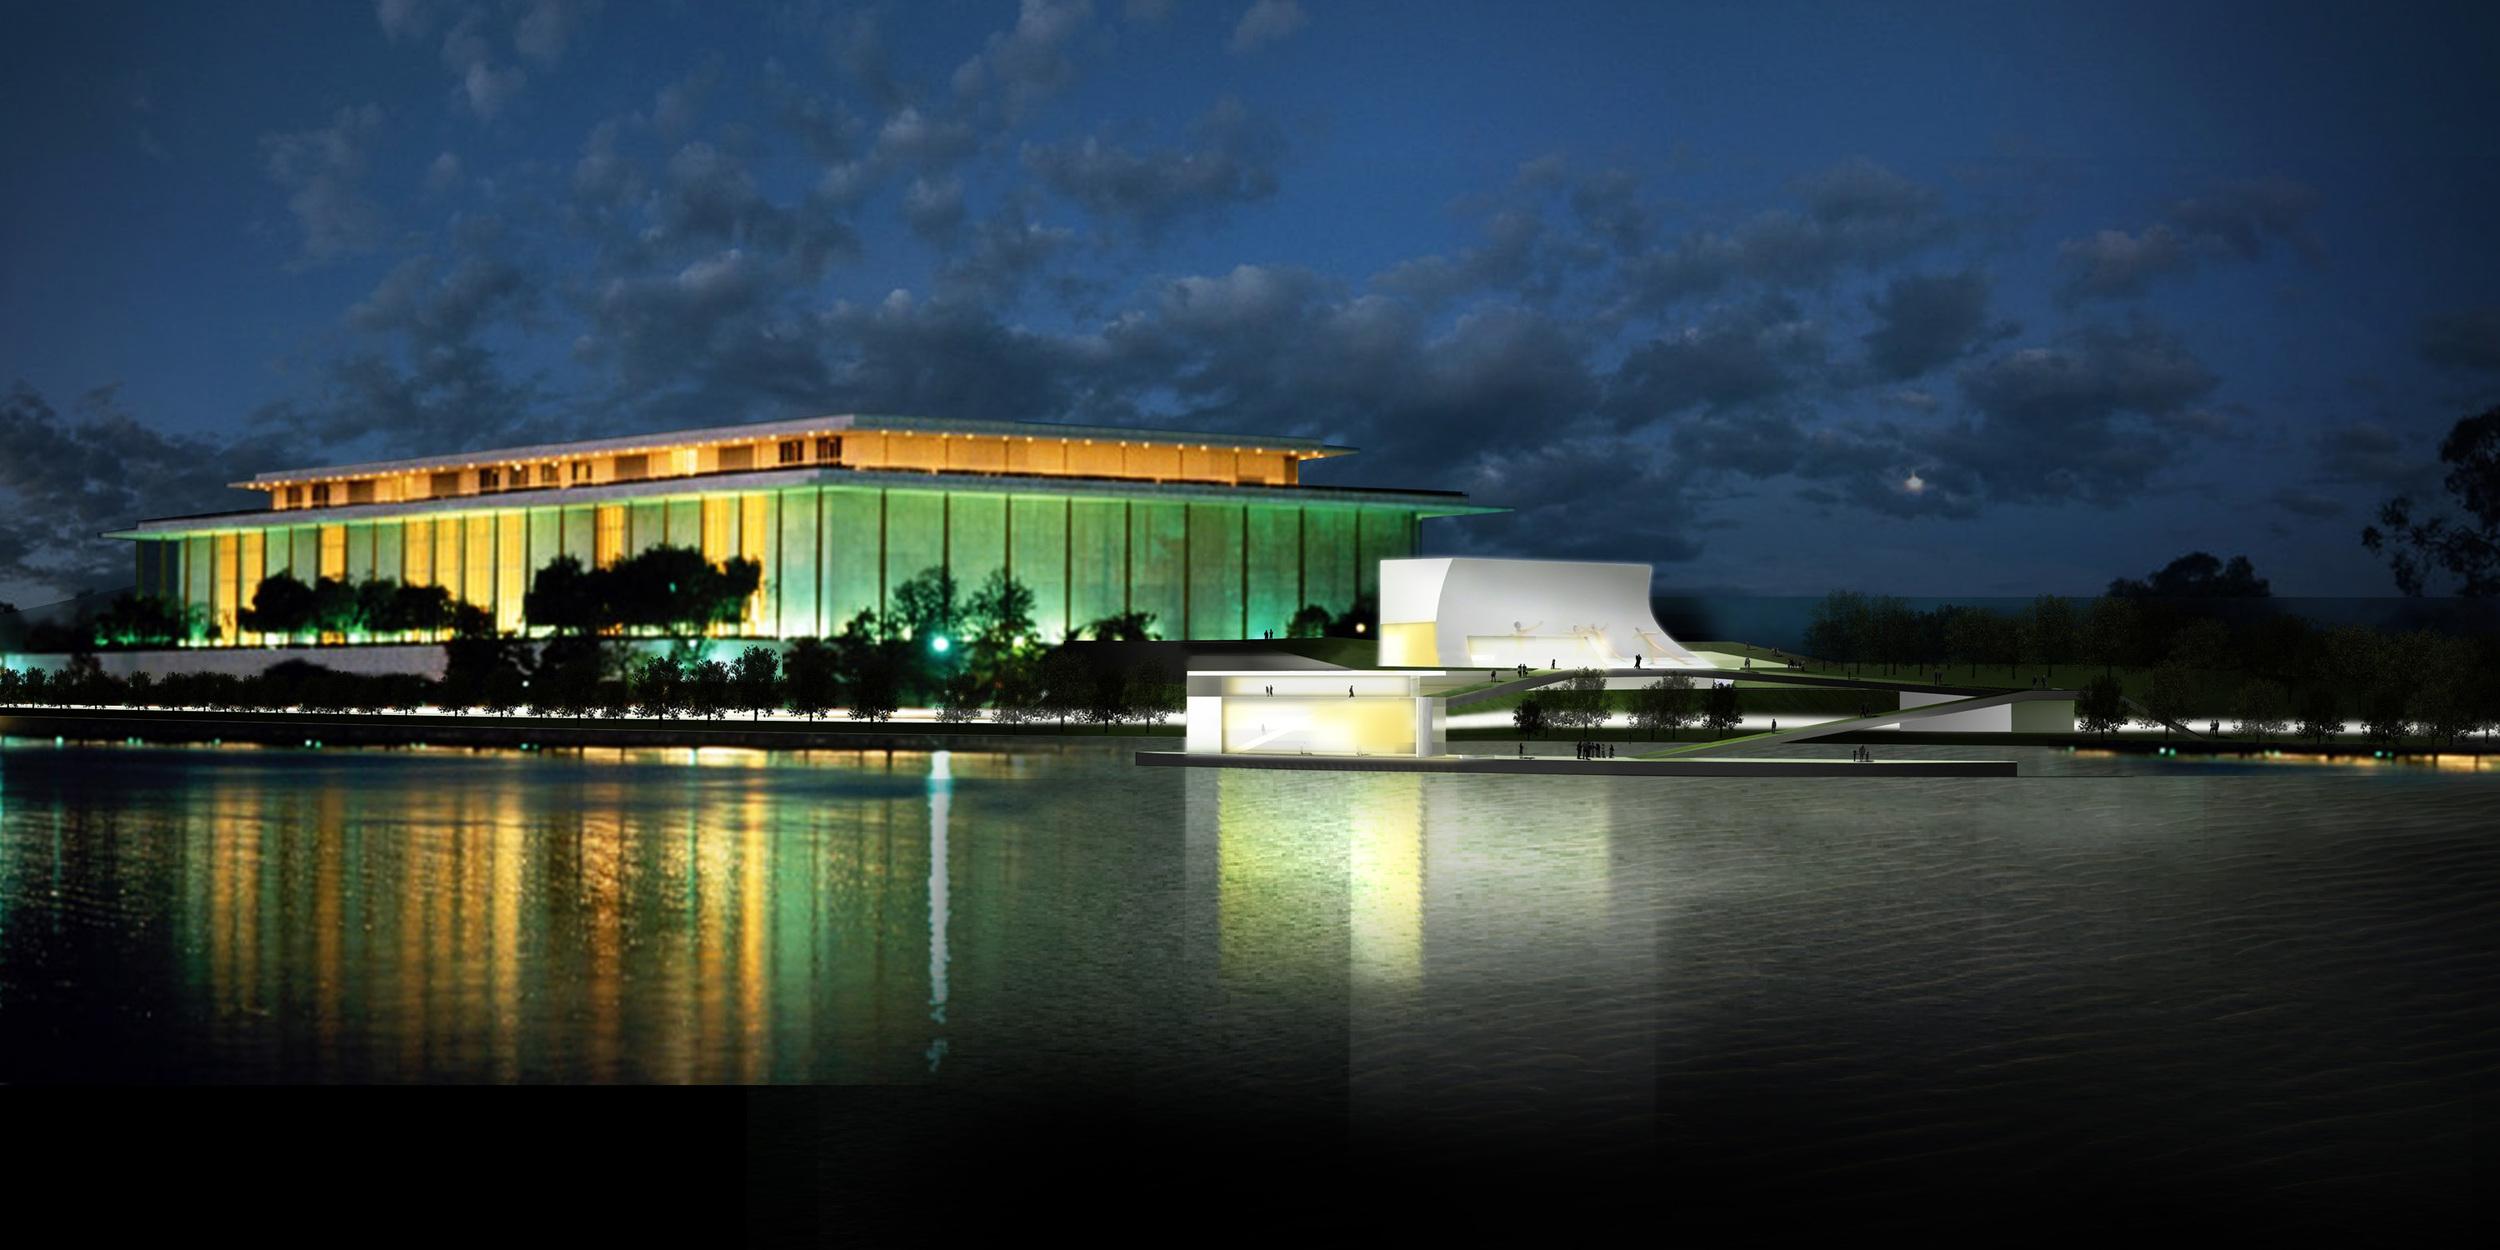 Kennedy Center in Washington, D.C.